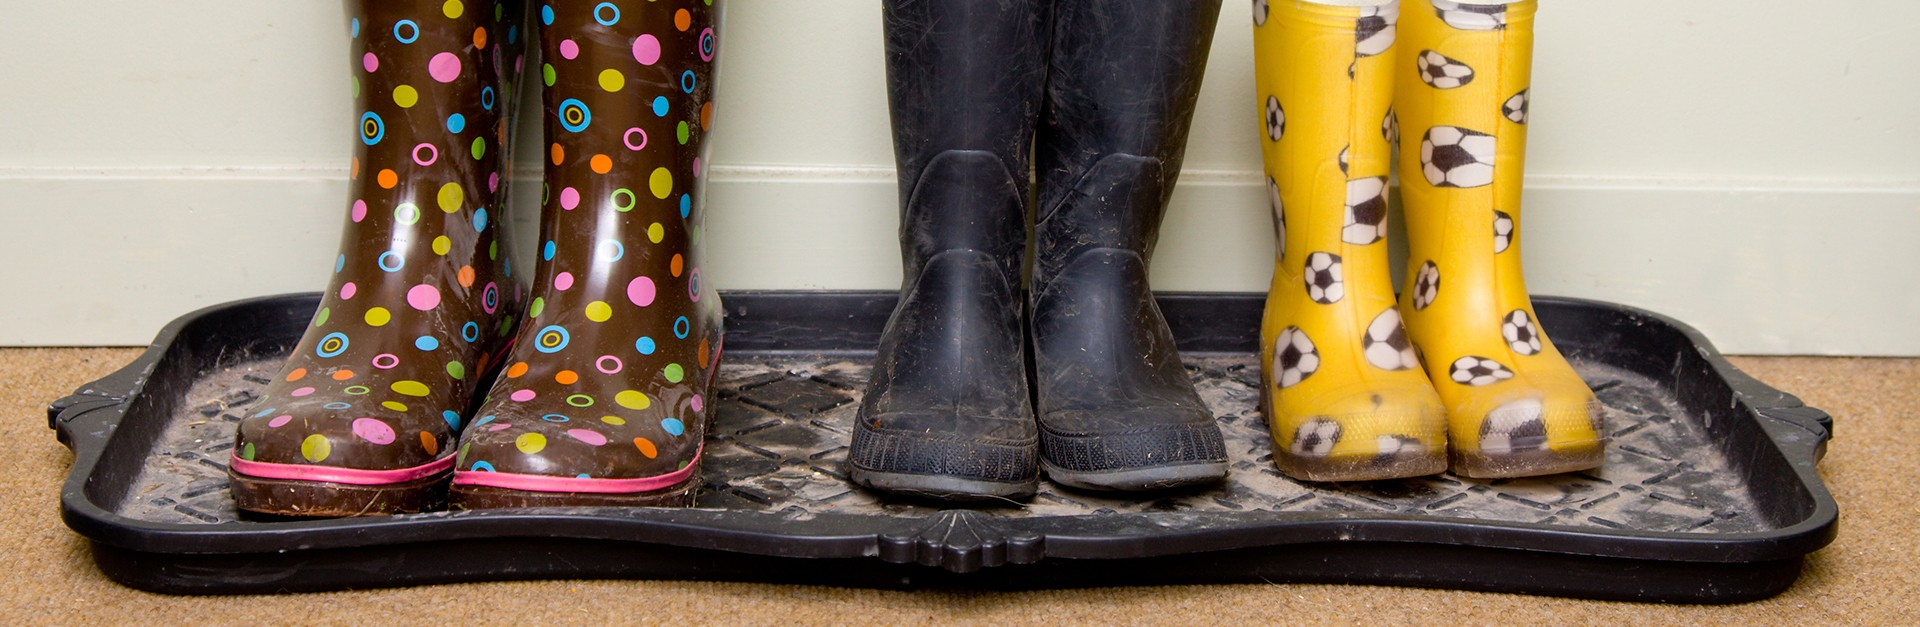 Boots on a rubber mat